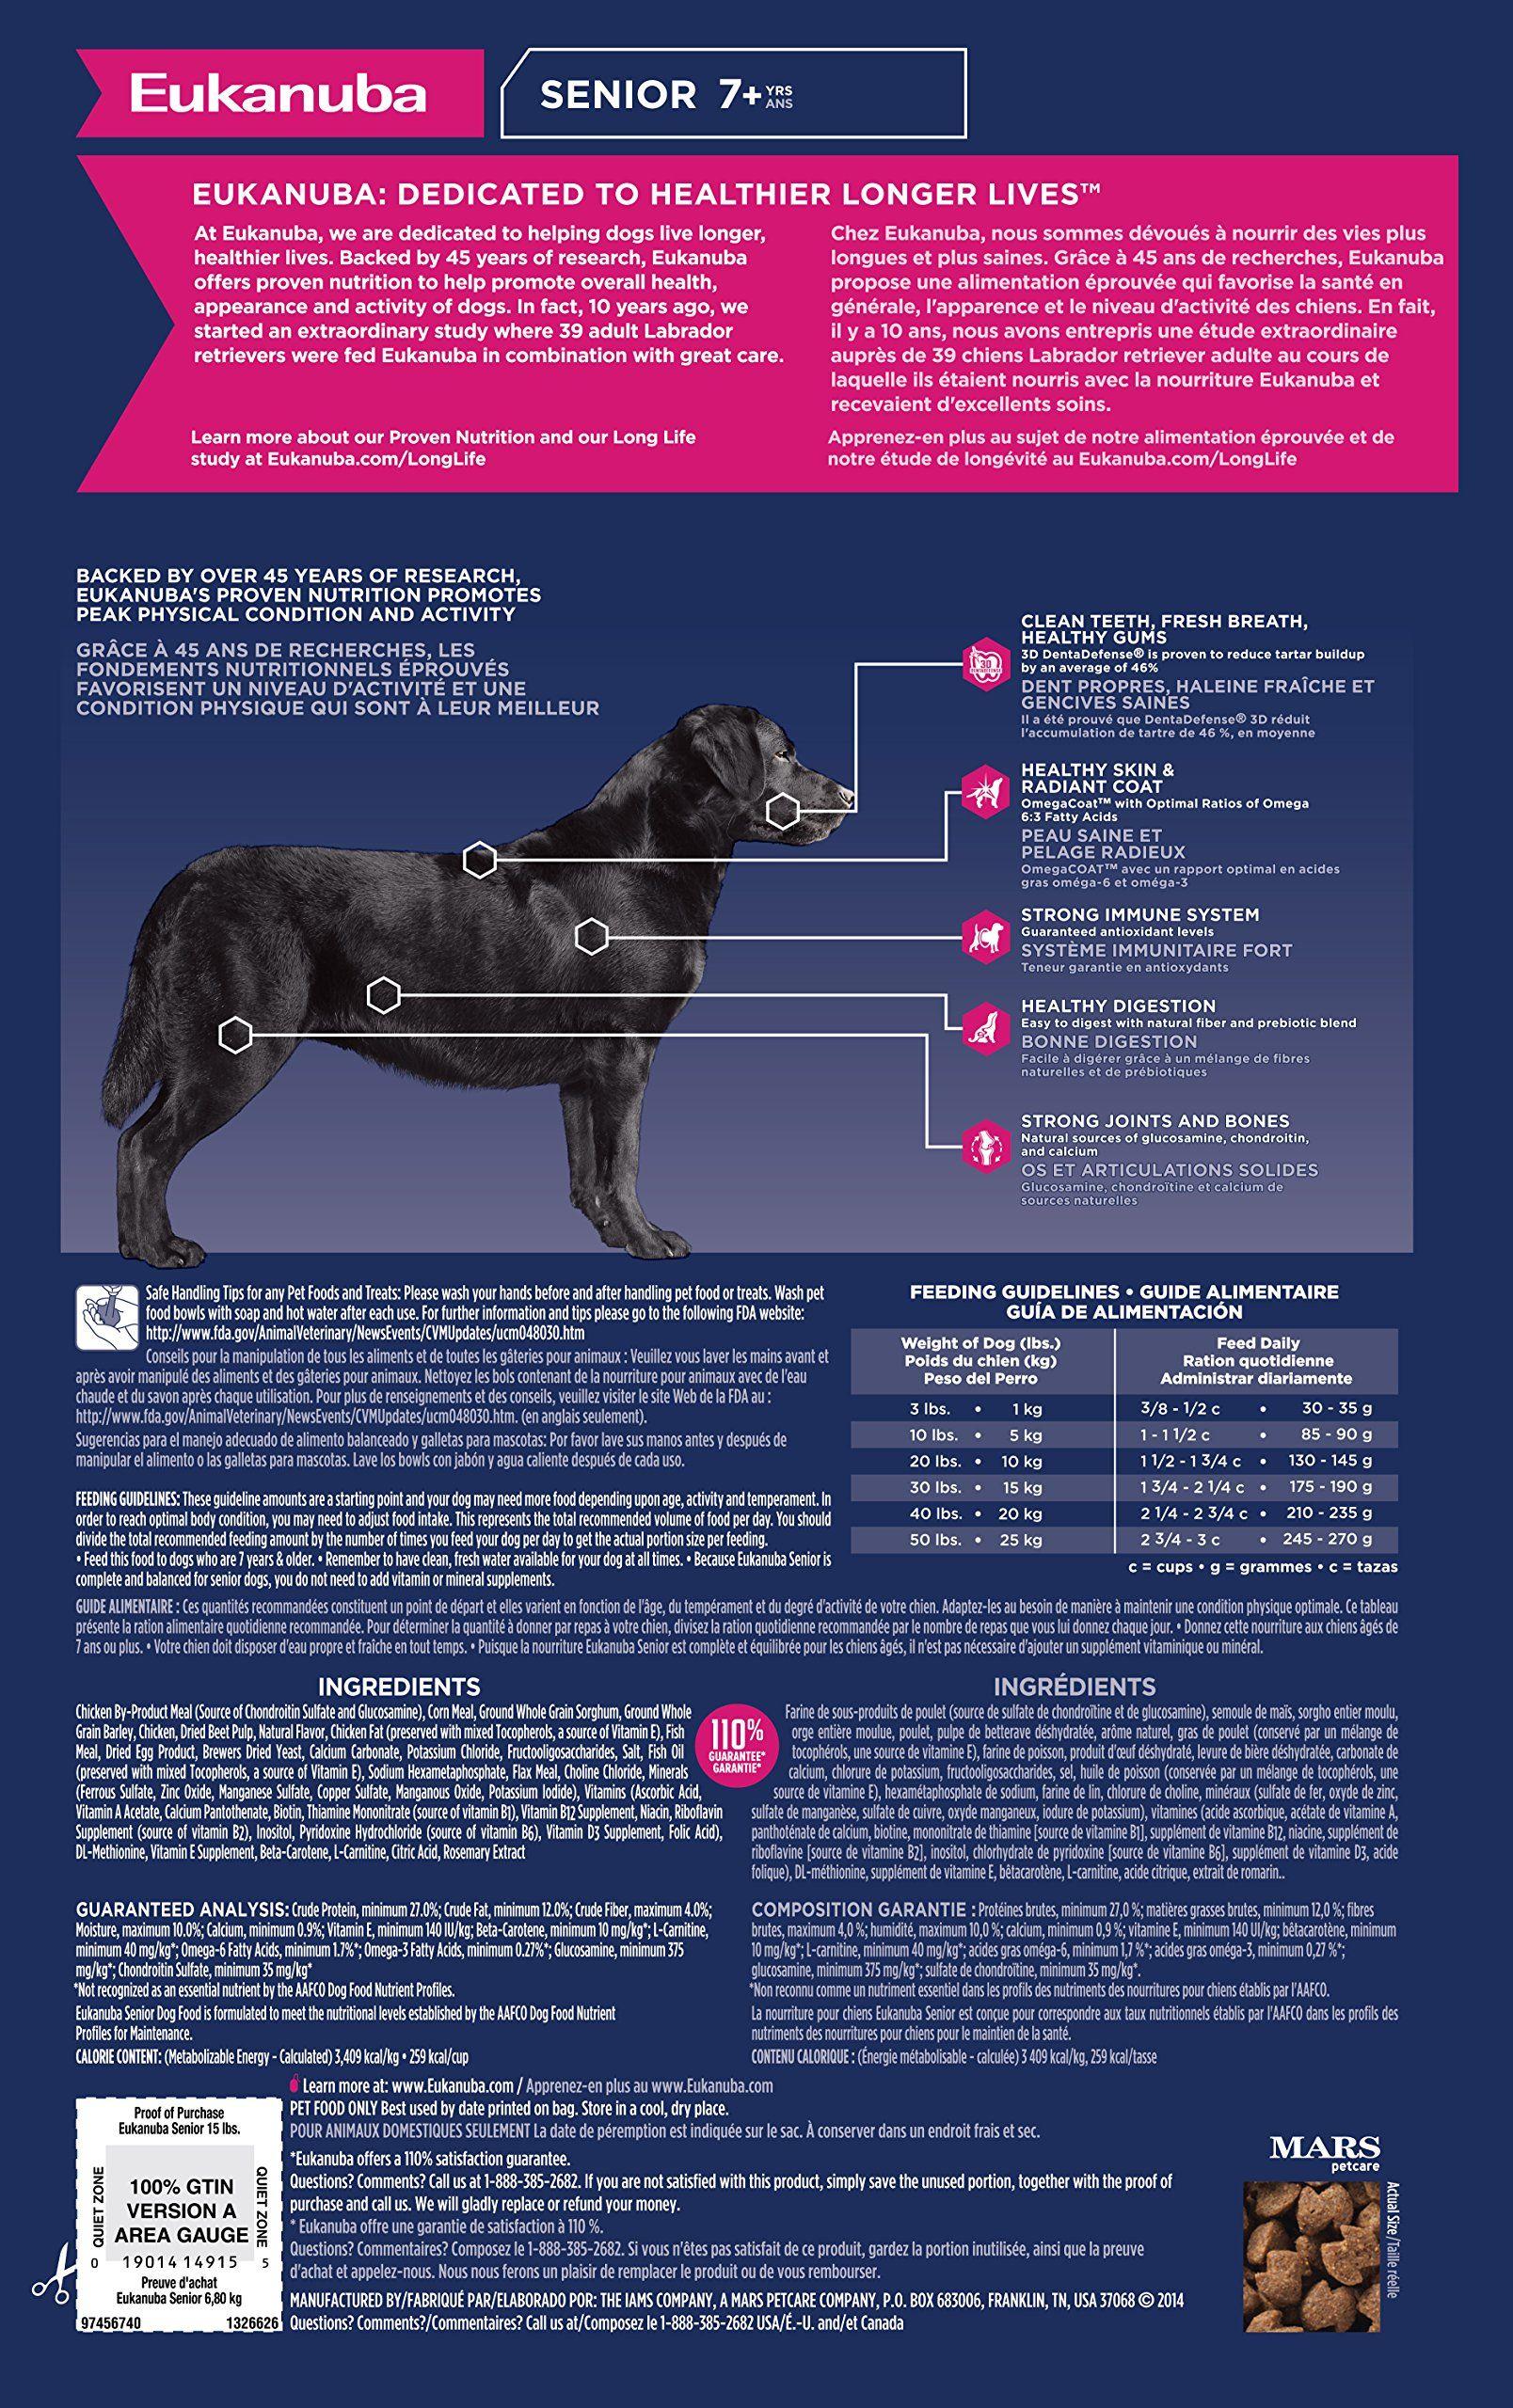 Eukanuba senior maintenance dog food 15 pounds read